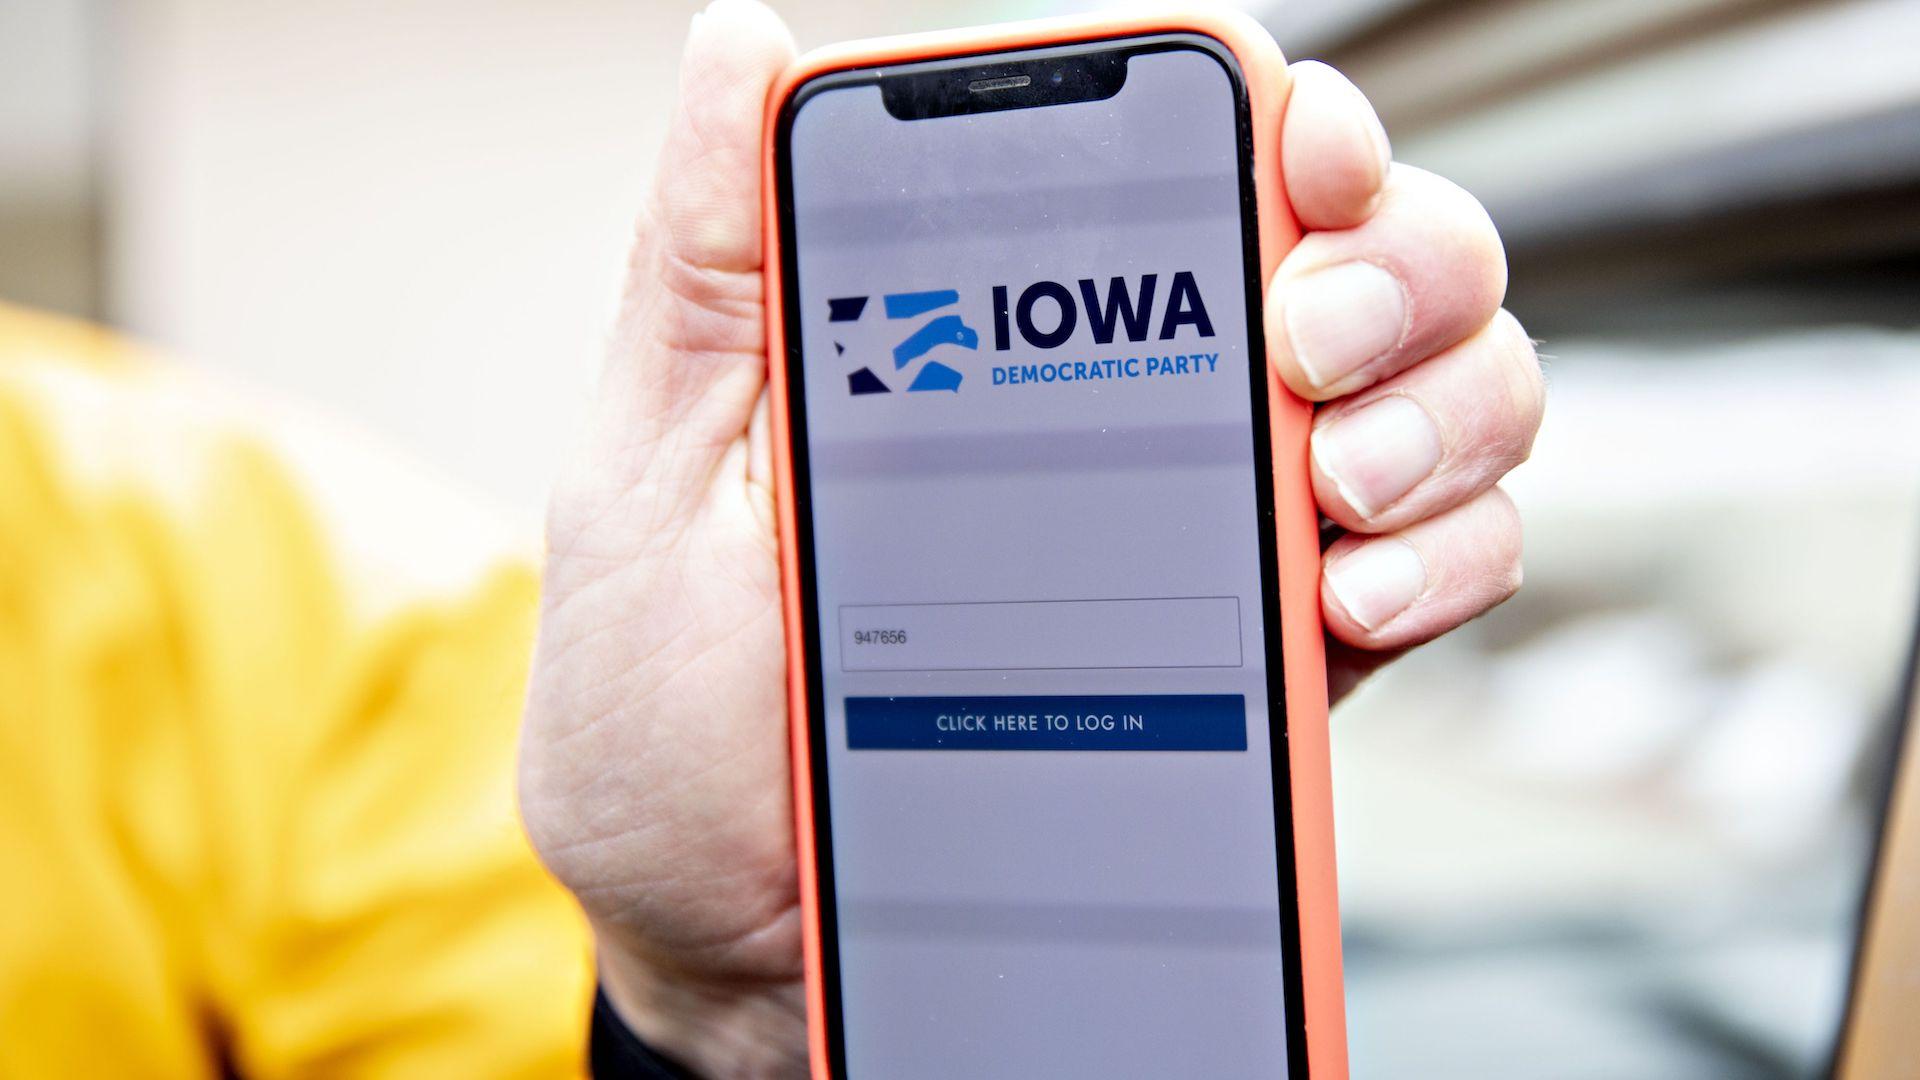 Hasil gambar untuk democratic chair calls for recanvass in iowa as national leaders raise new questions about handling of app